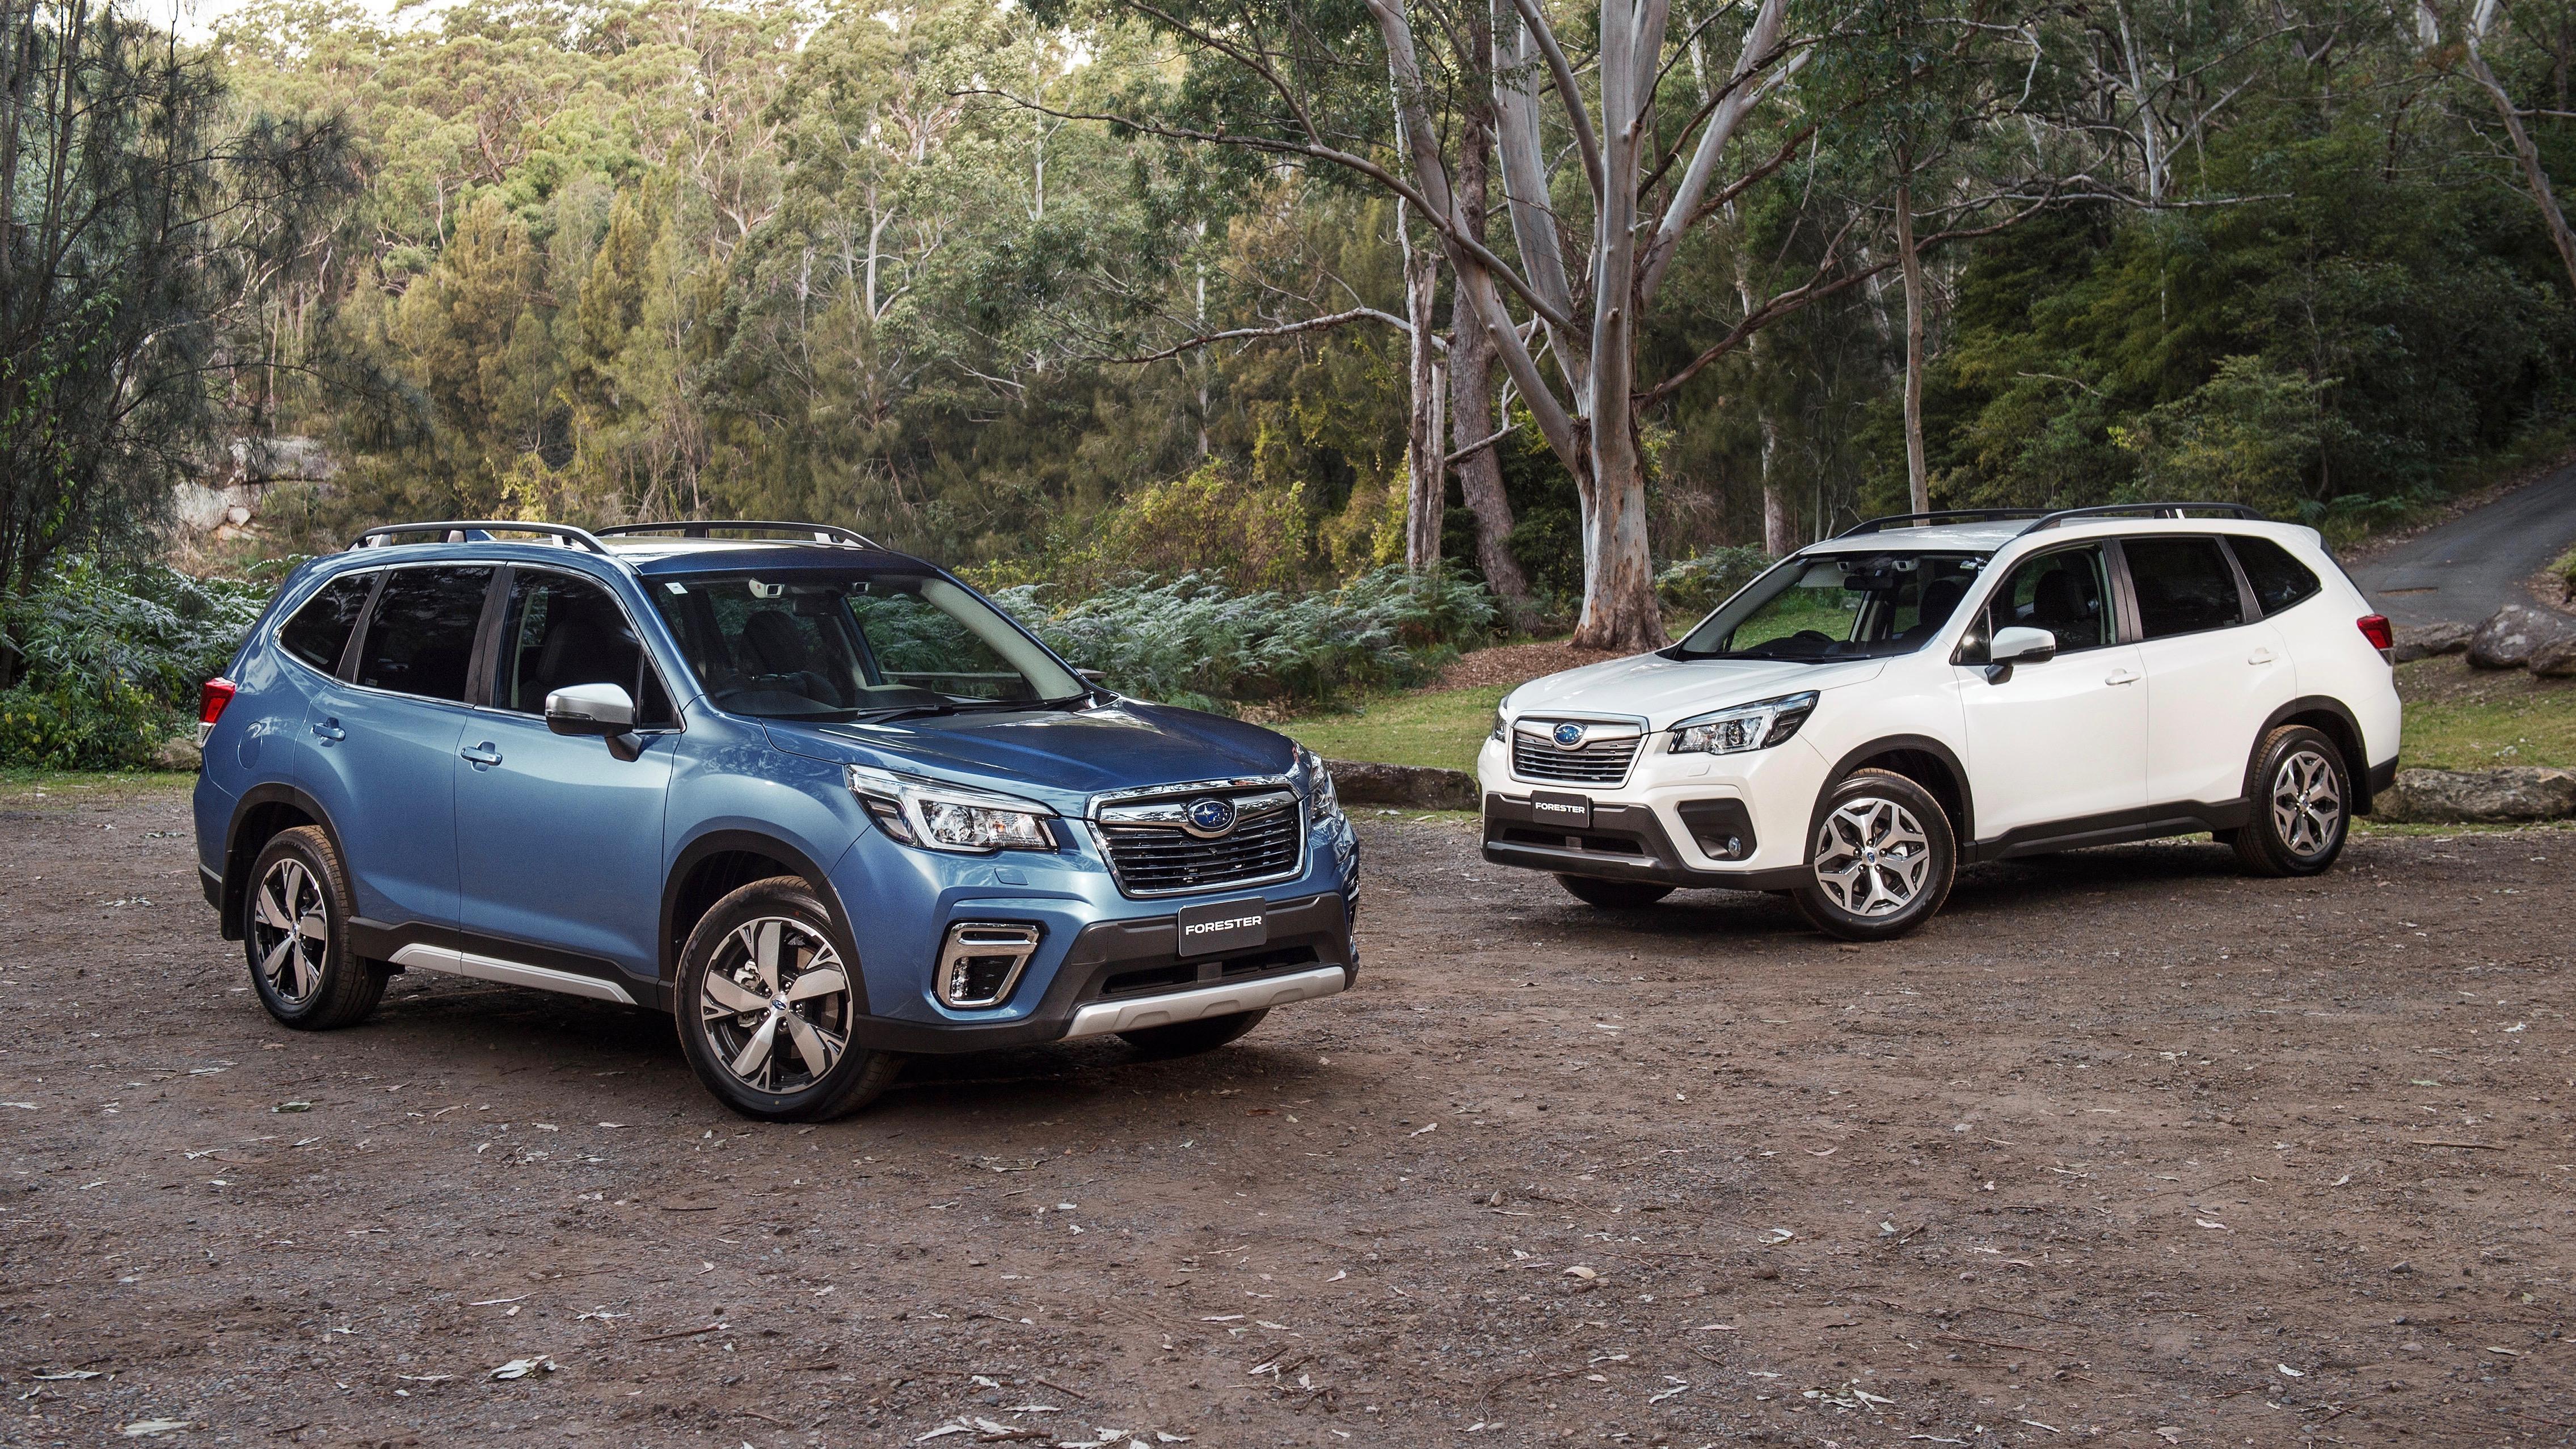 2019 Subaru Forester 2.5i-S + 2.5i-L